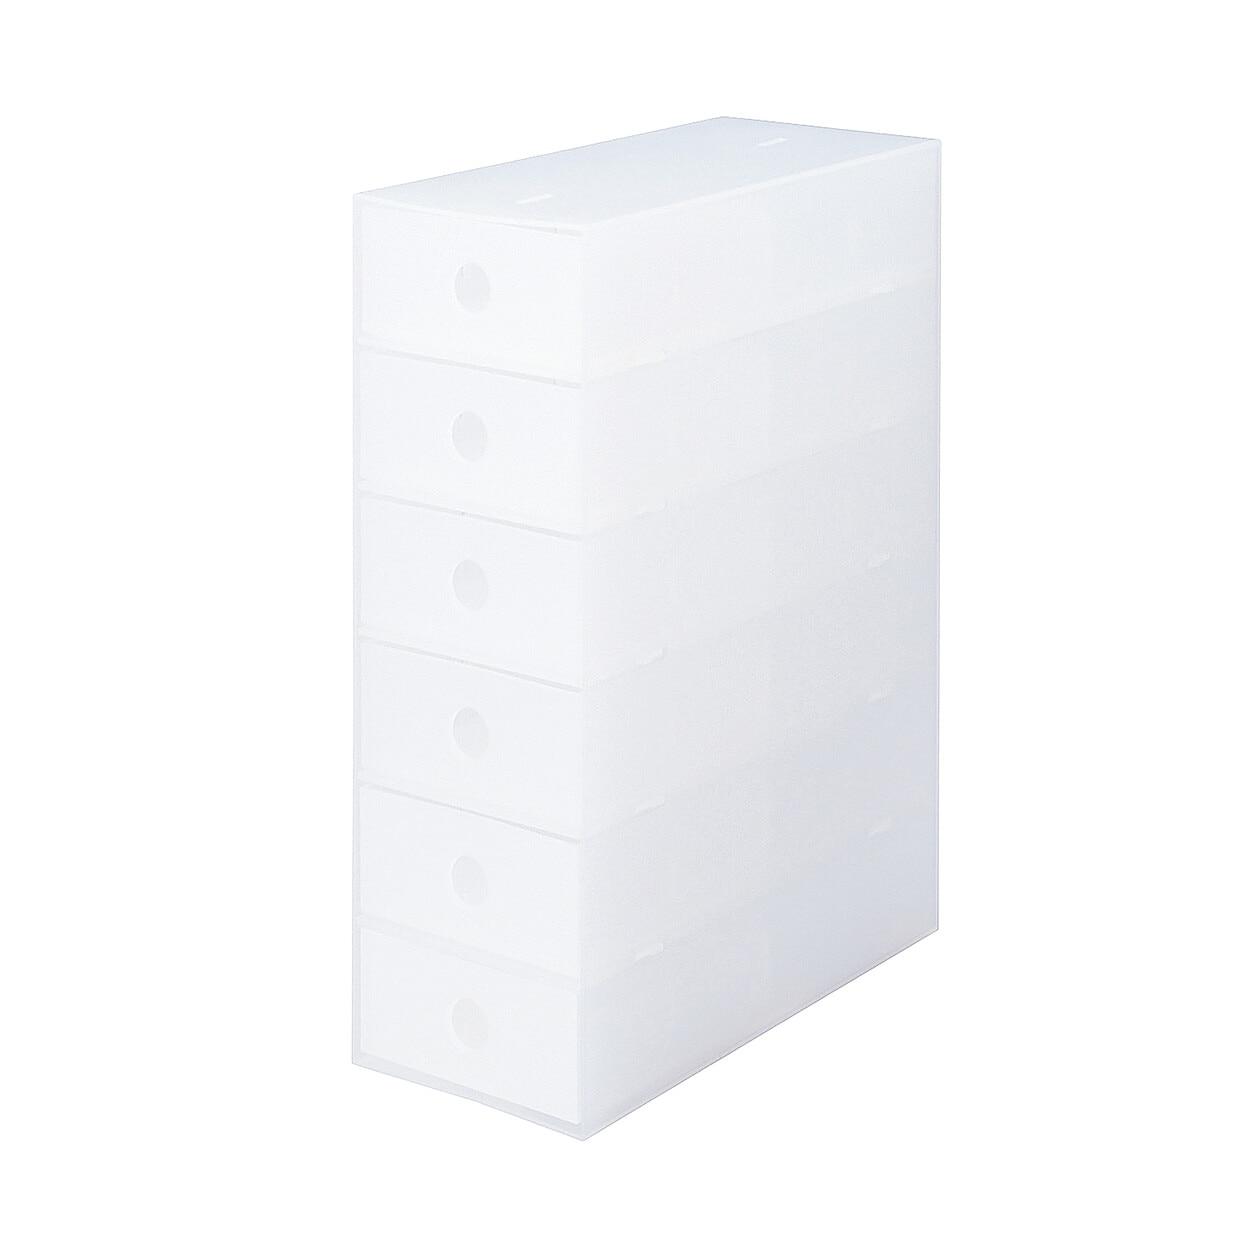 RoomClip商品情報 - ポリプロピレン小物収納ボックス6段・A4タテ